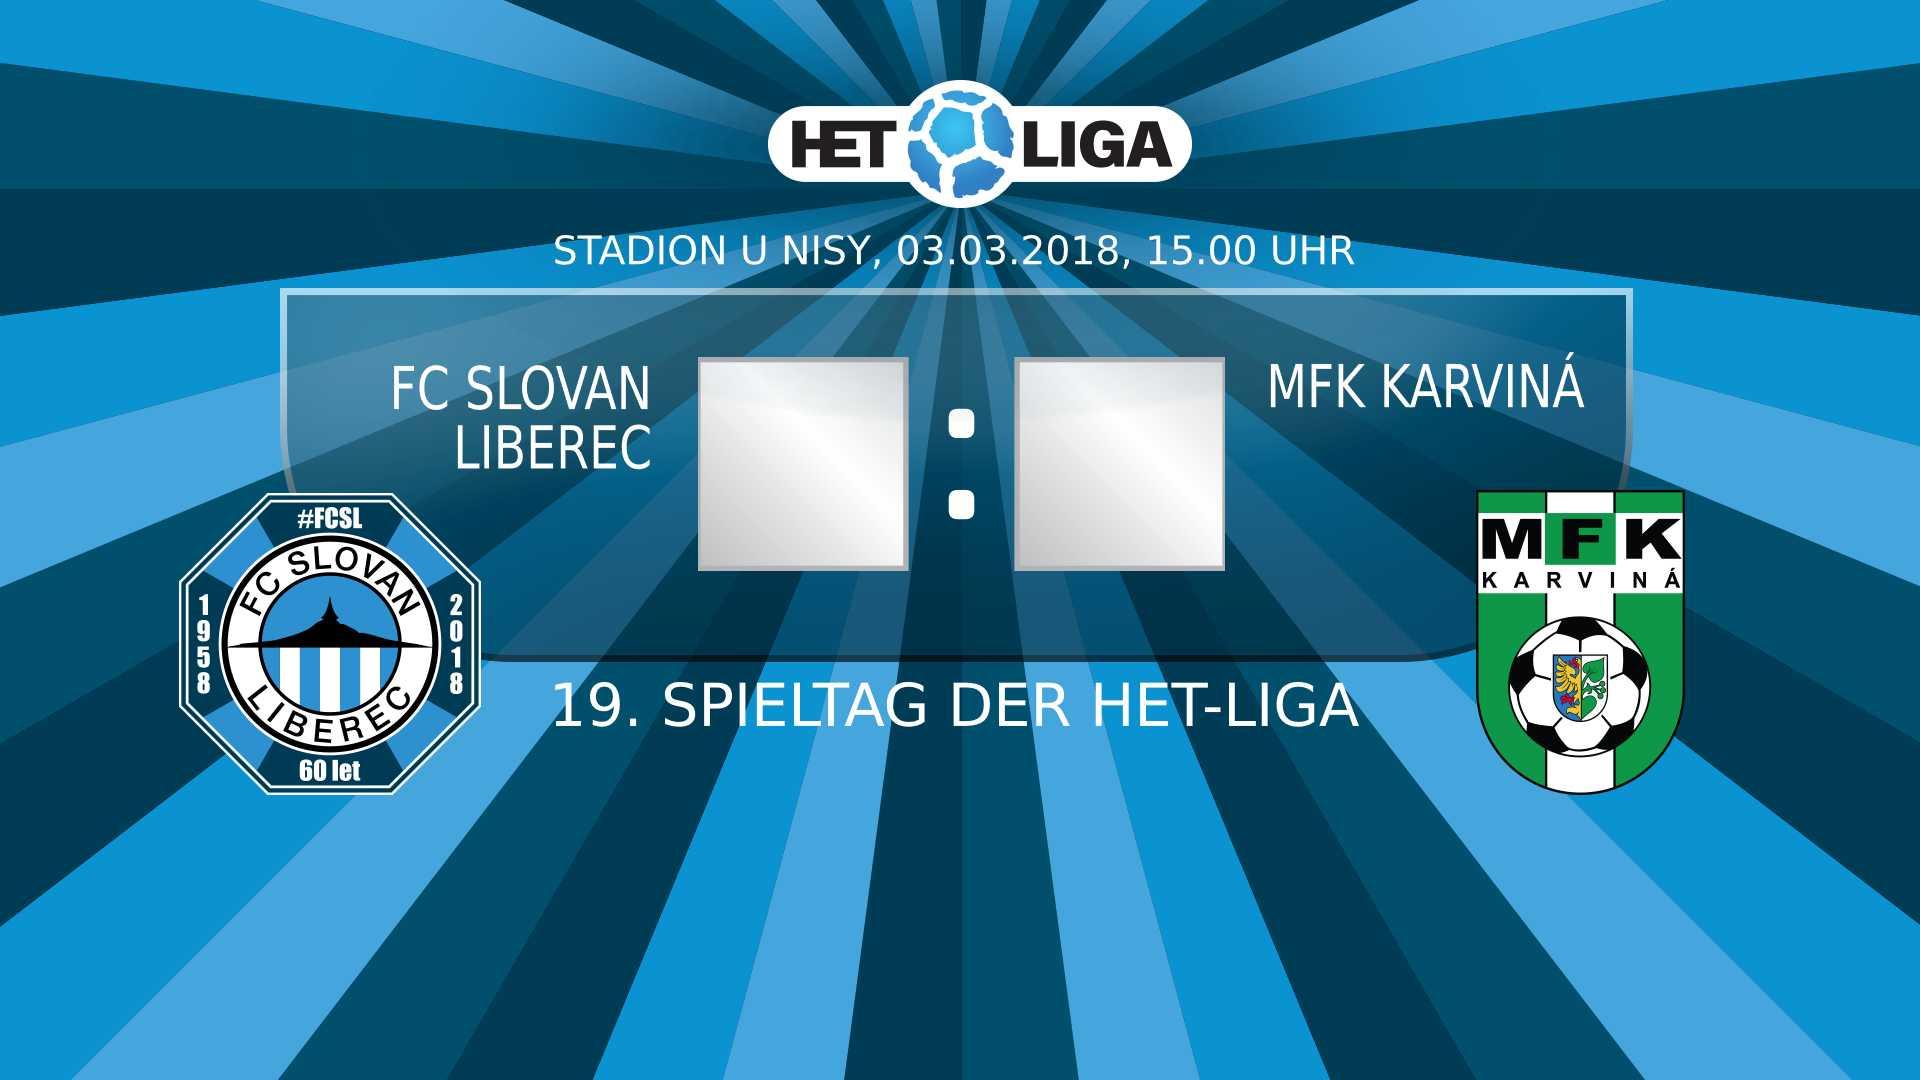 Vorbericht: Der Kampf um Platz zwei wird am Samstag gegen Kárvina fortgesetzt